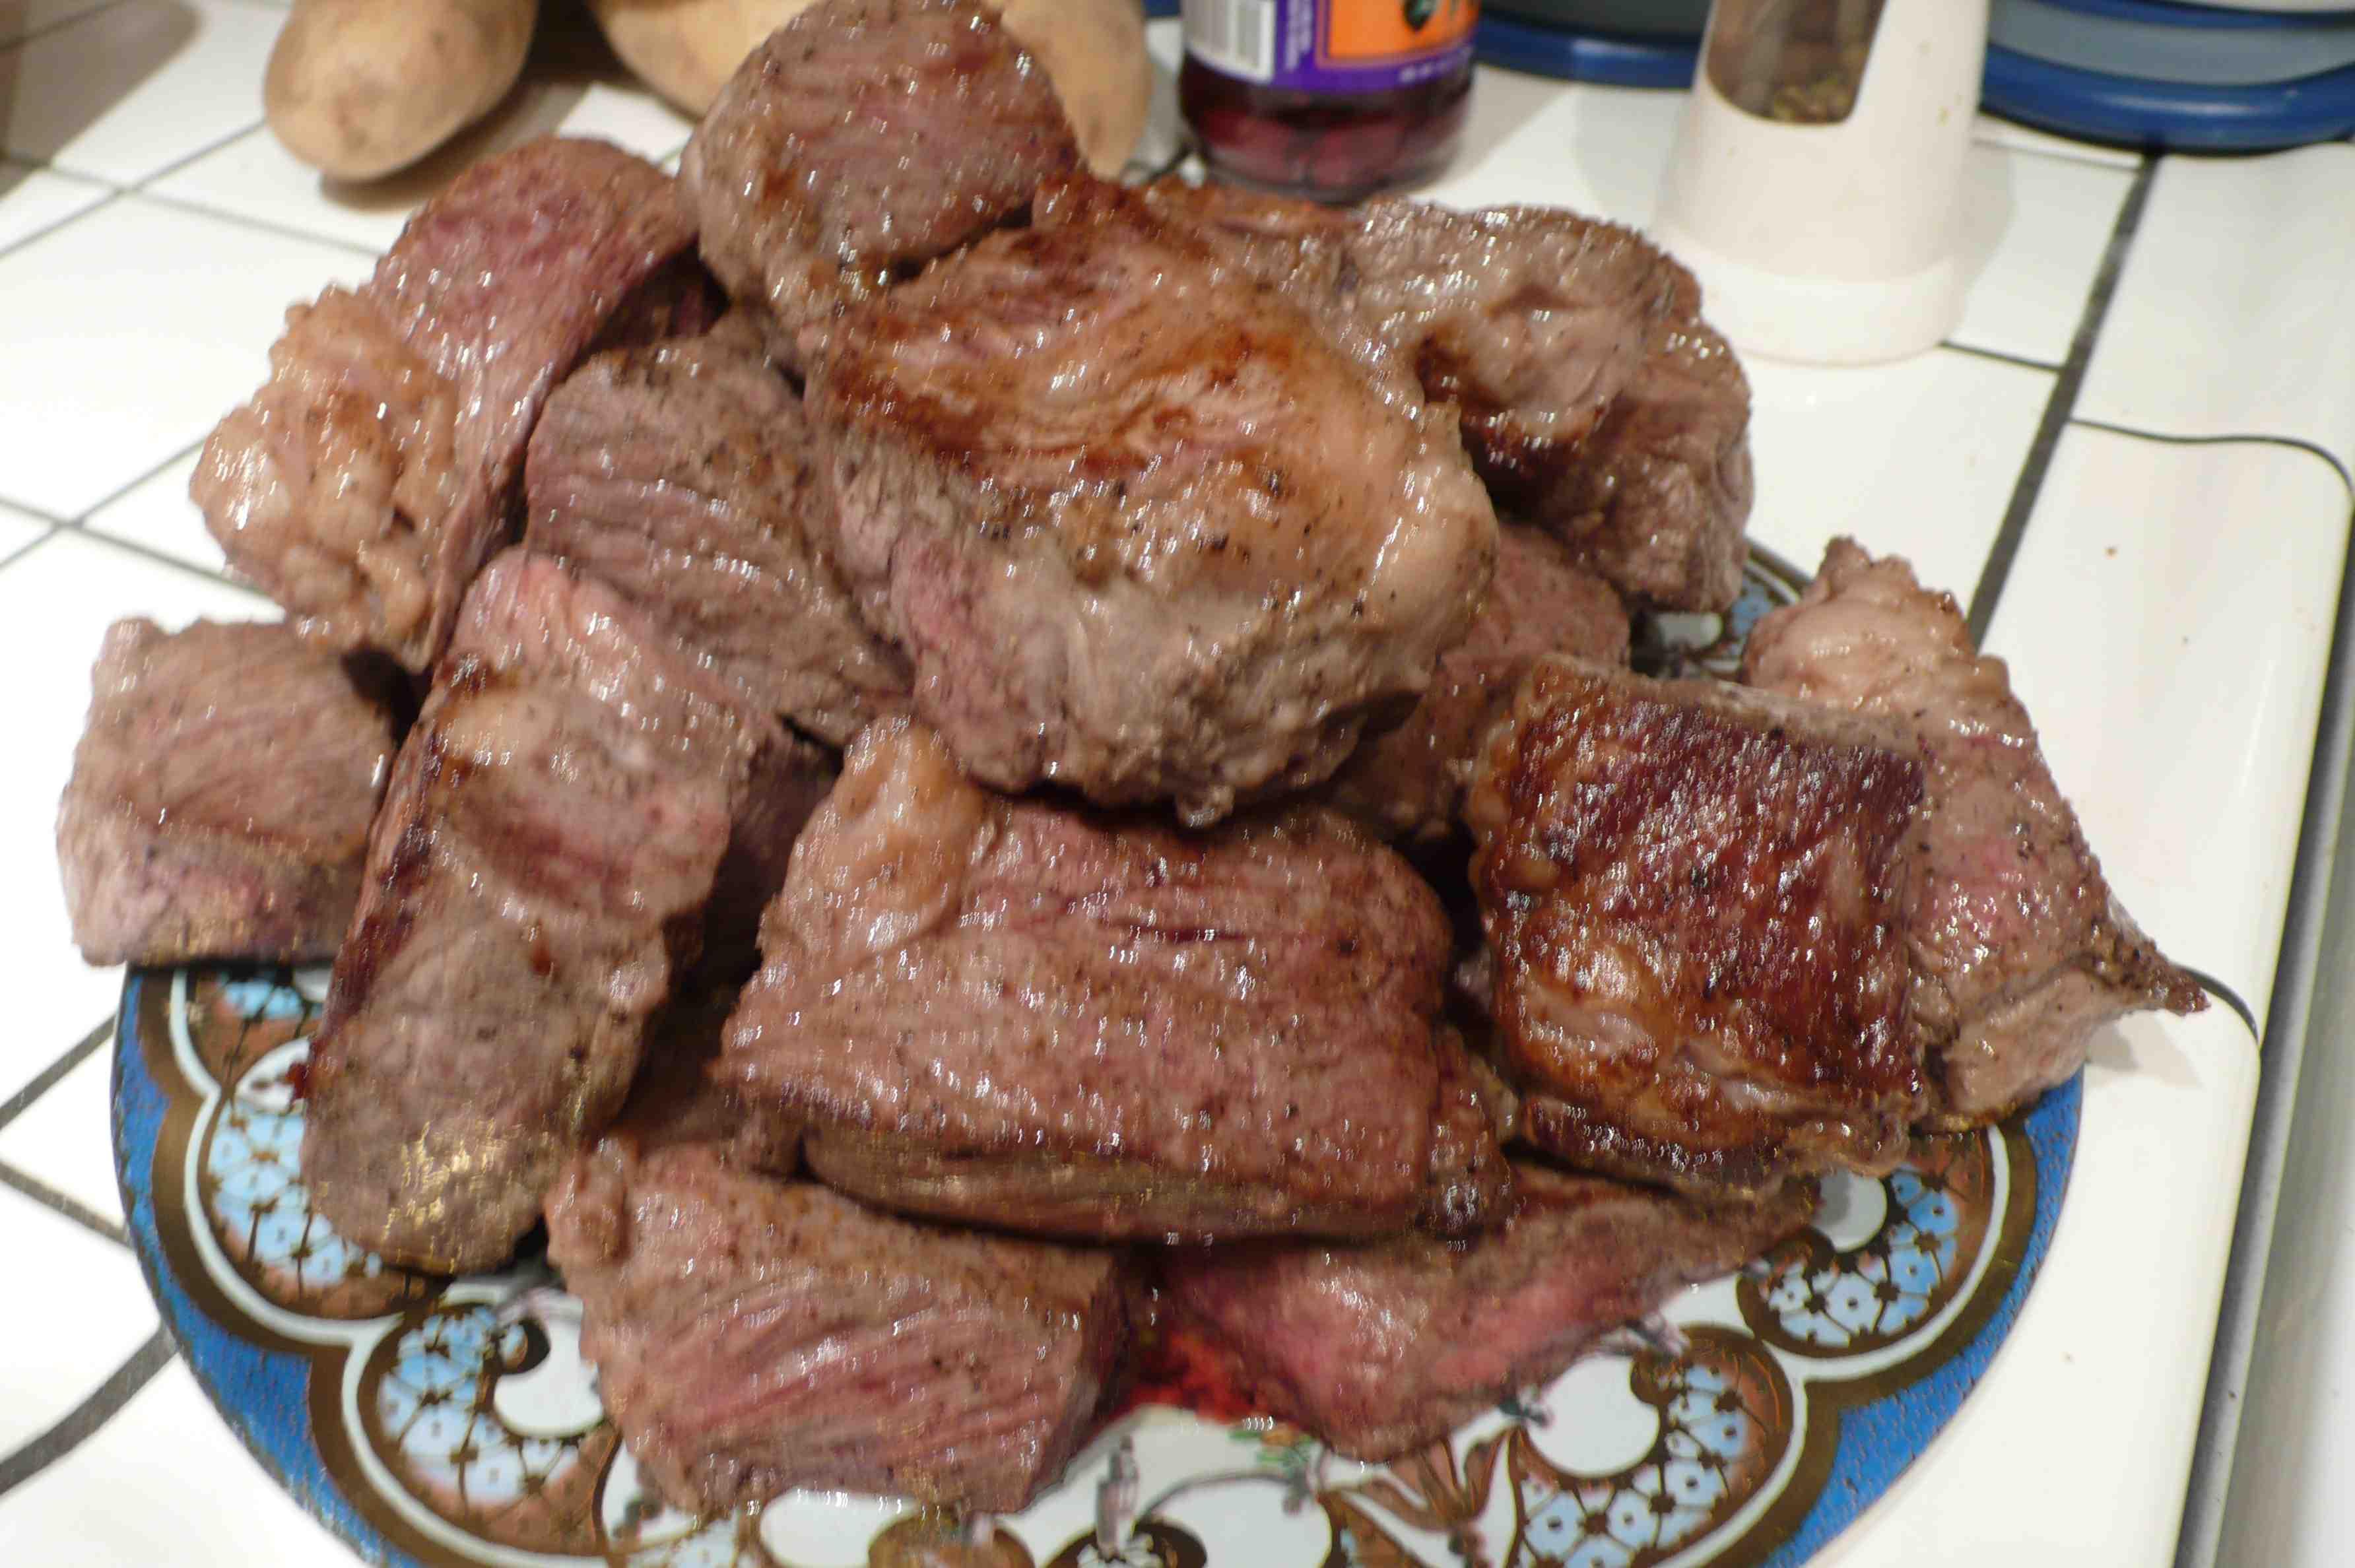 Braised meat